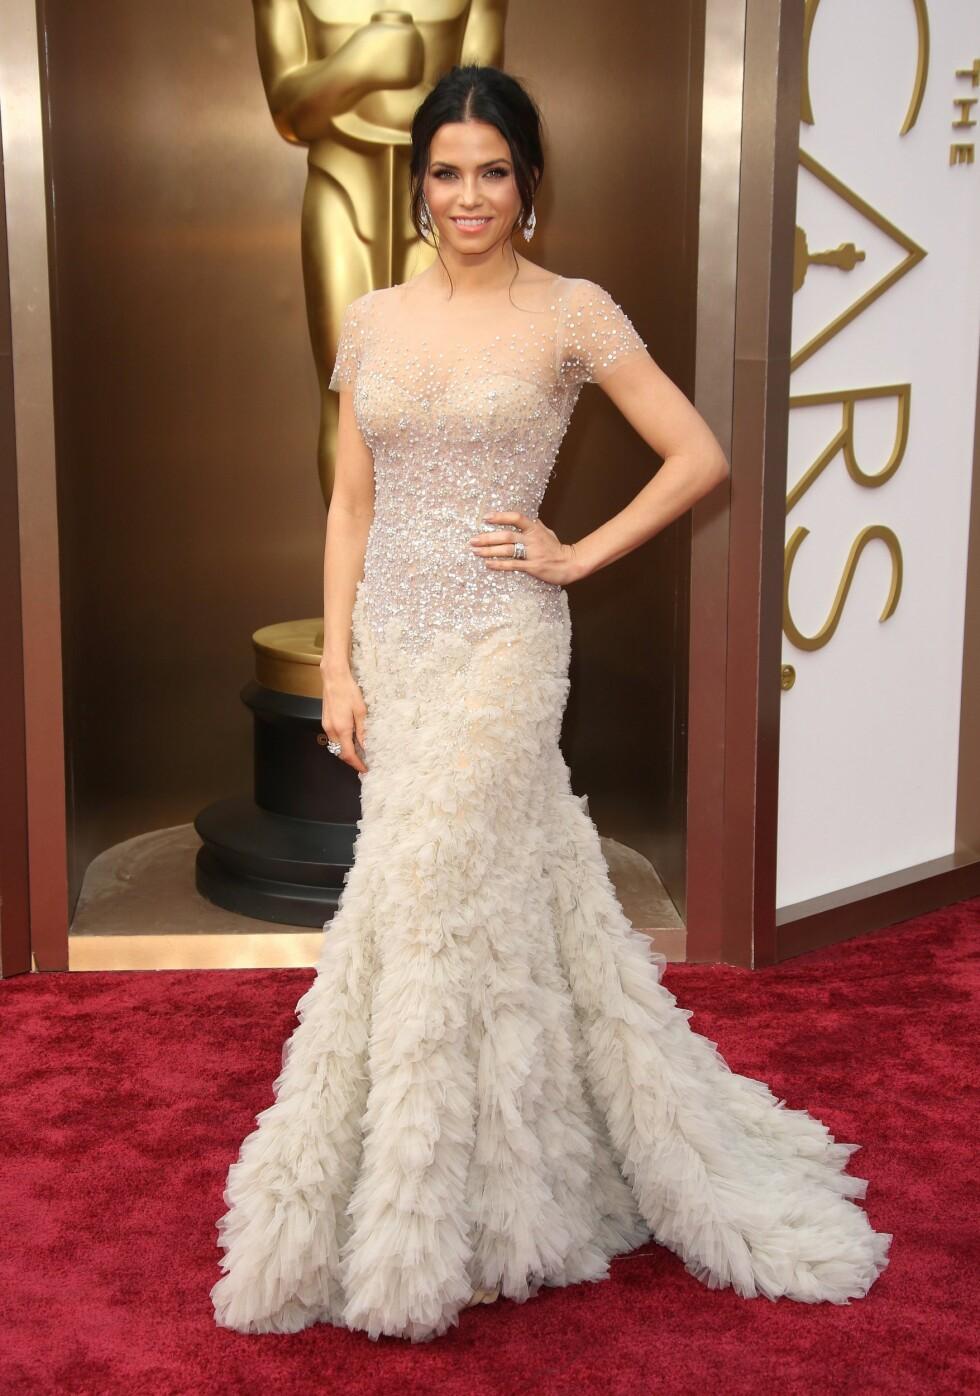 Jenna Dewan-Tatum i kjole fra Reem Acra. Foto: All Over Press